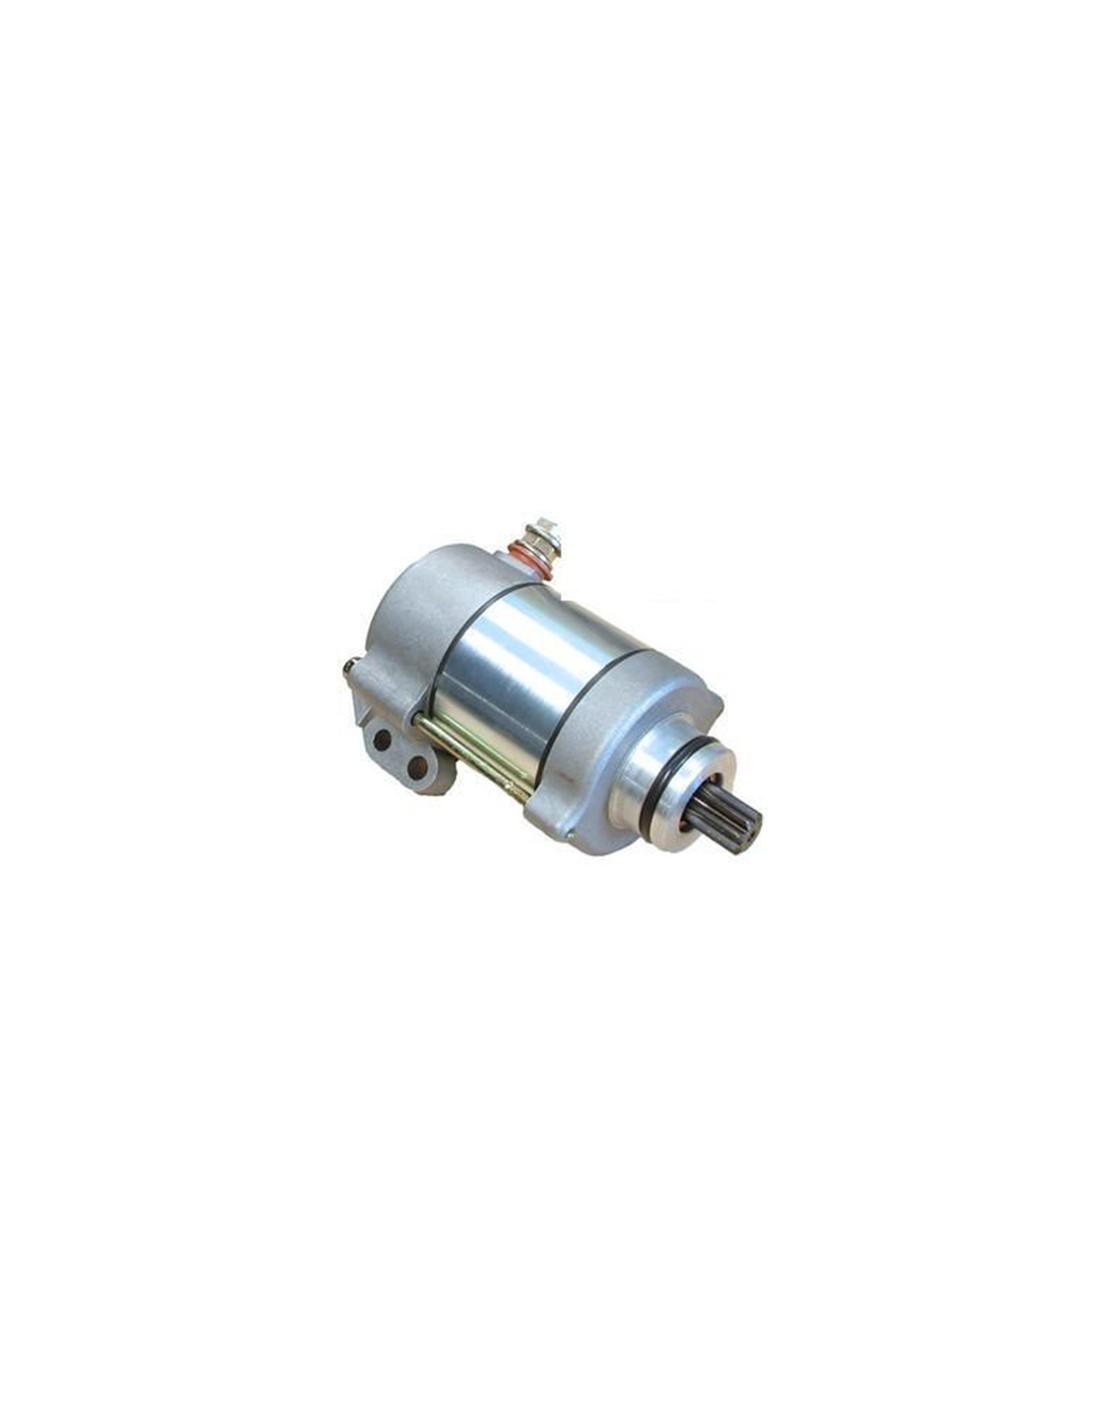 Schema Elettrico Ktm Exc : Motorino avviamento elettrico arrowhead watt ktm exc